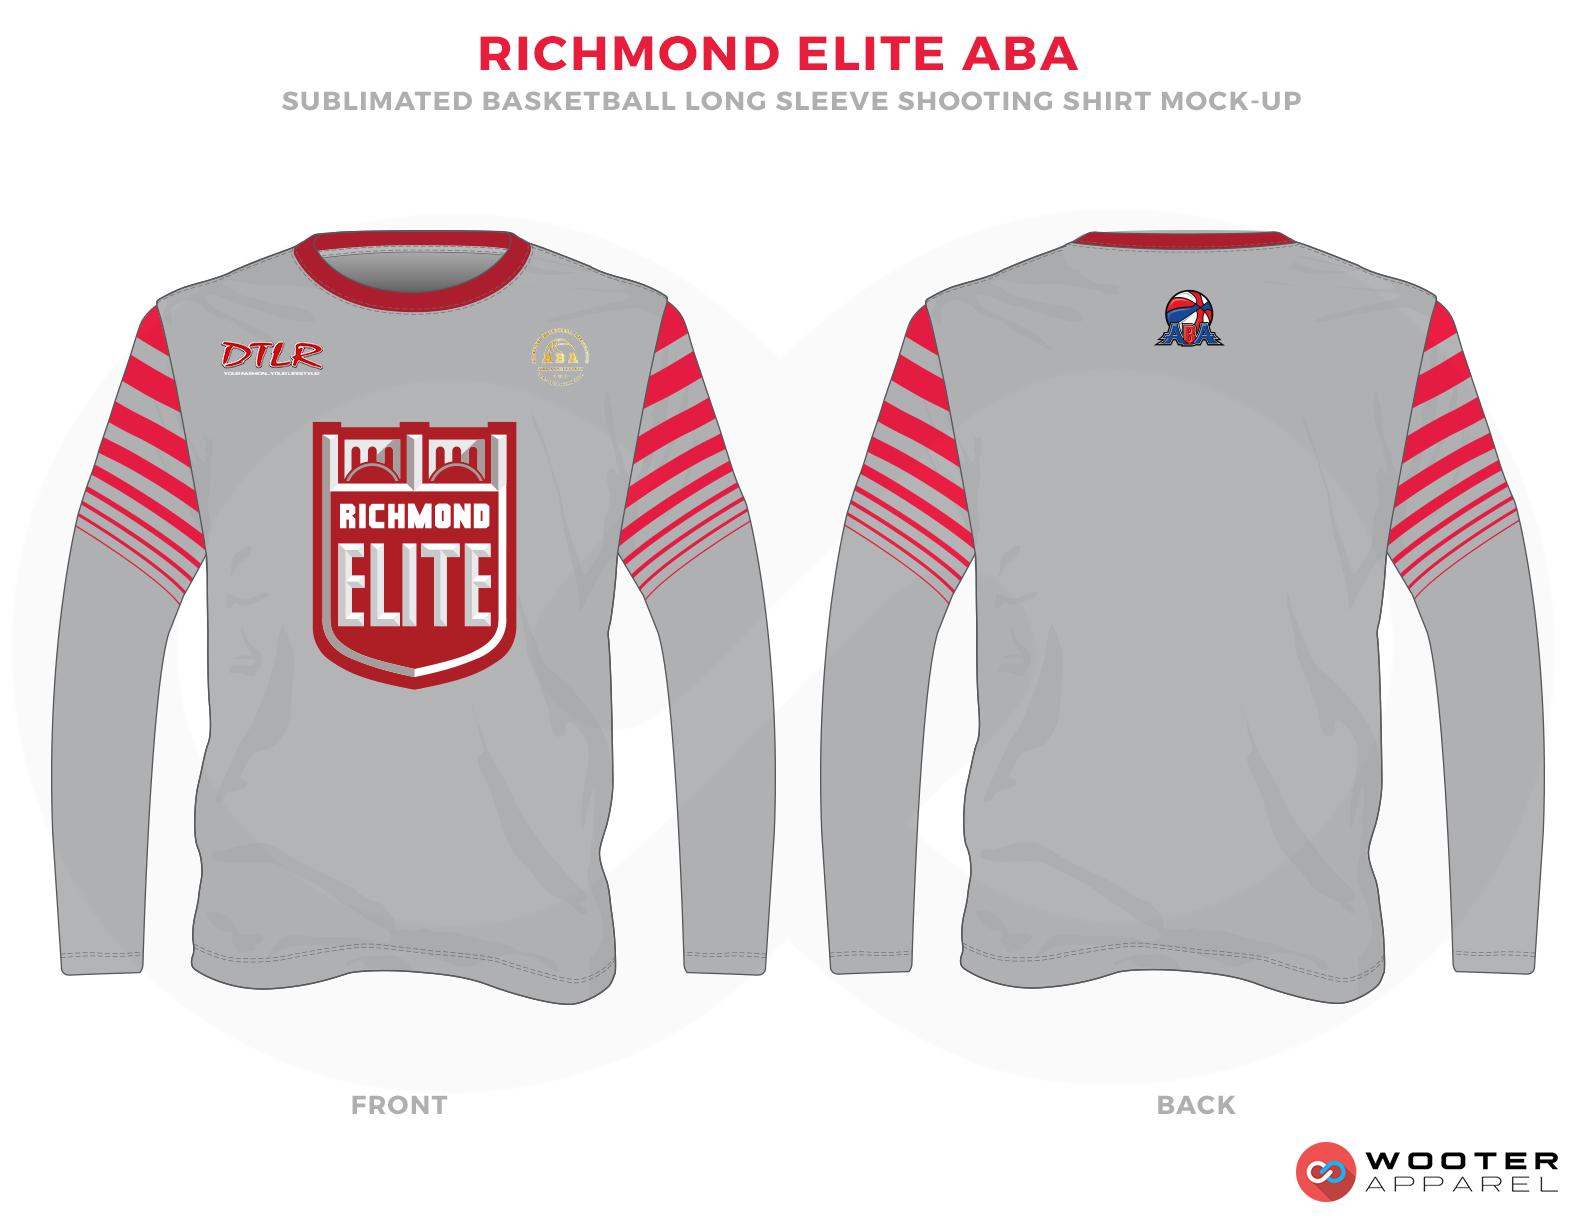 RICHMOND ELITE ABA Grey Red and White Premium Shooting Shirt